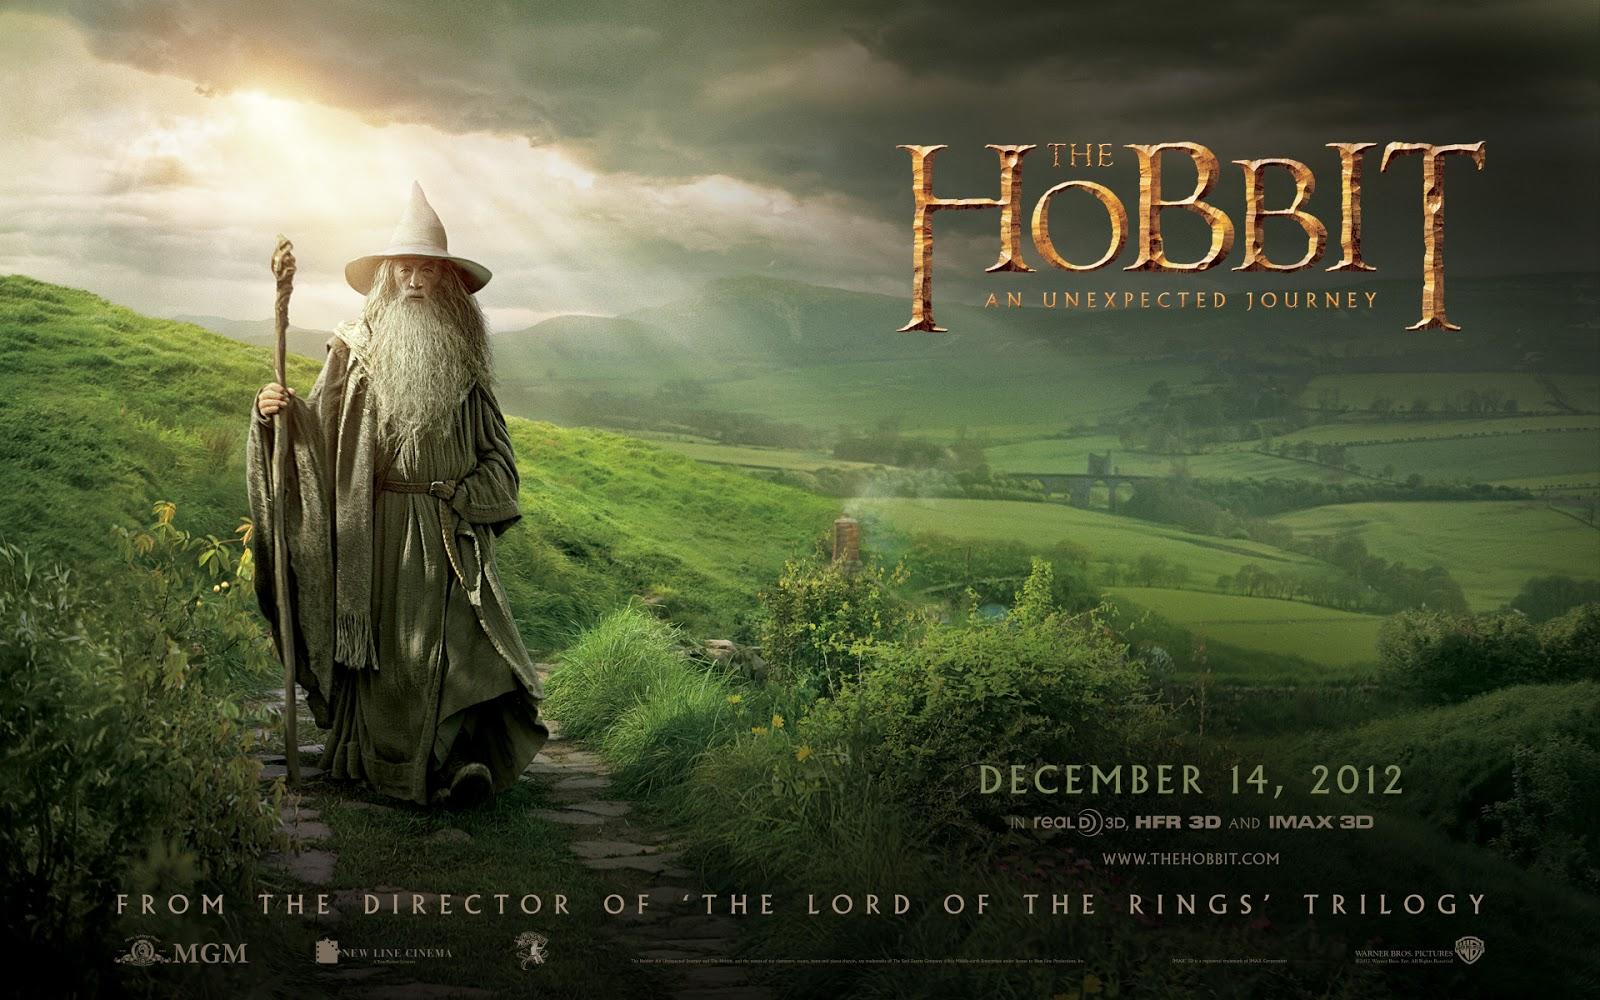 http://3.bp.blogspot.com/-w-ohZRHnvOo/UMUI7bYF8QI/AAAAAAAALx8/FO9tVmUANck/s1600/02_wallpaper_o_hobbit_uma_jornada_inesperada.jpg